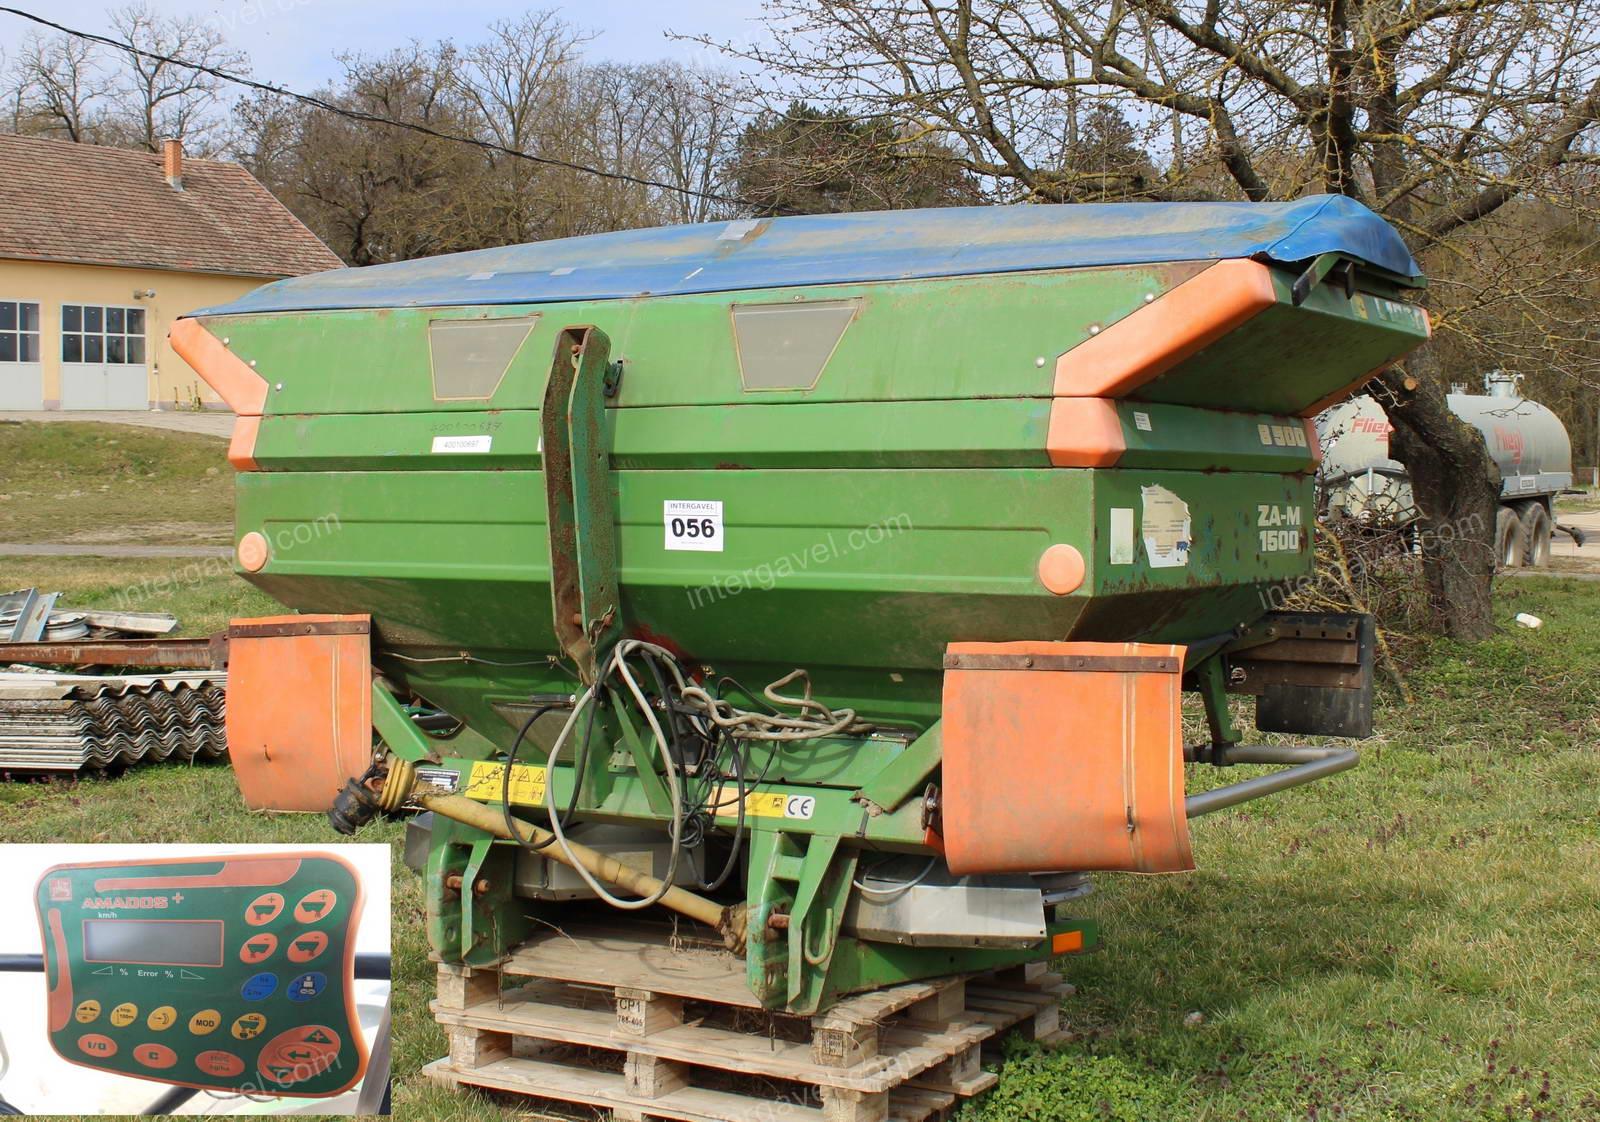 Fertilizer spreader - Amazone-Werke, ZA-M 1500